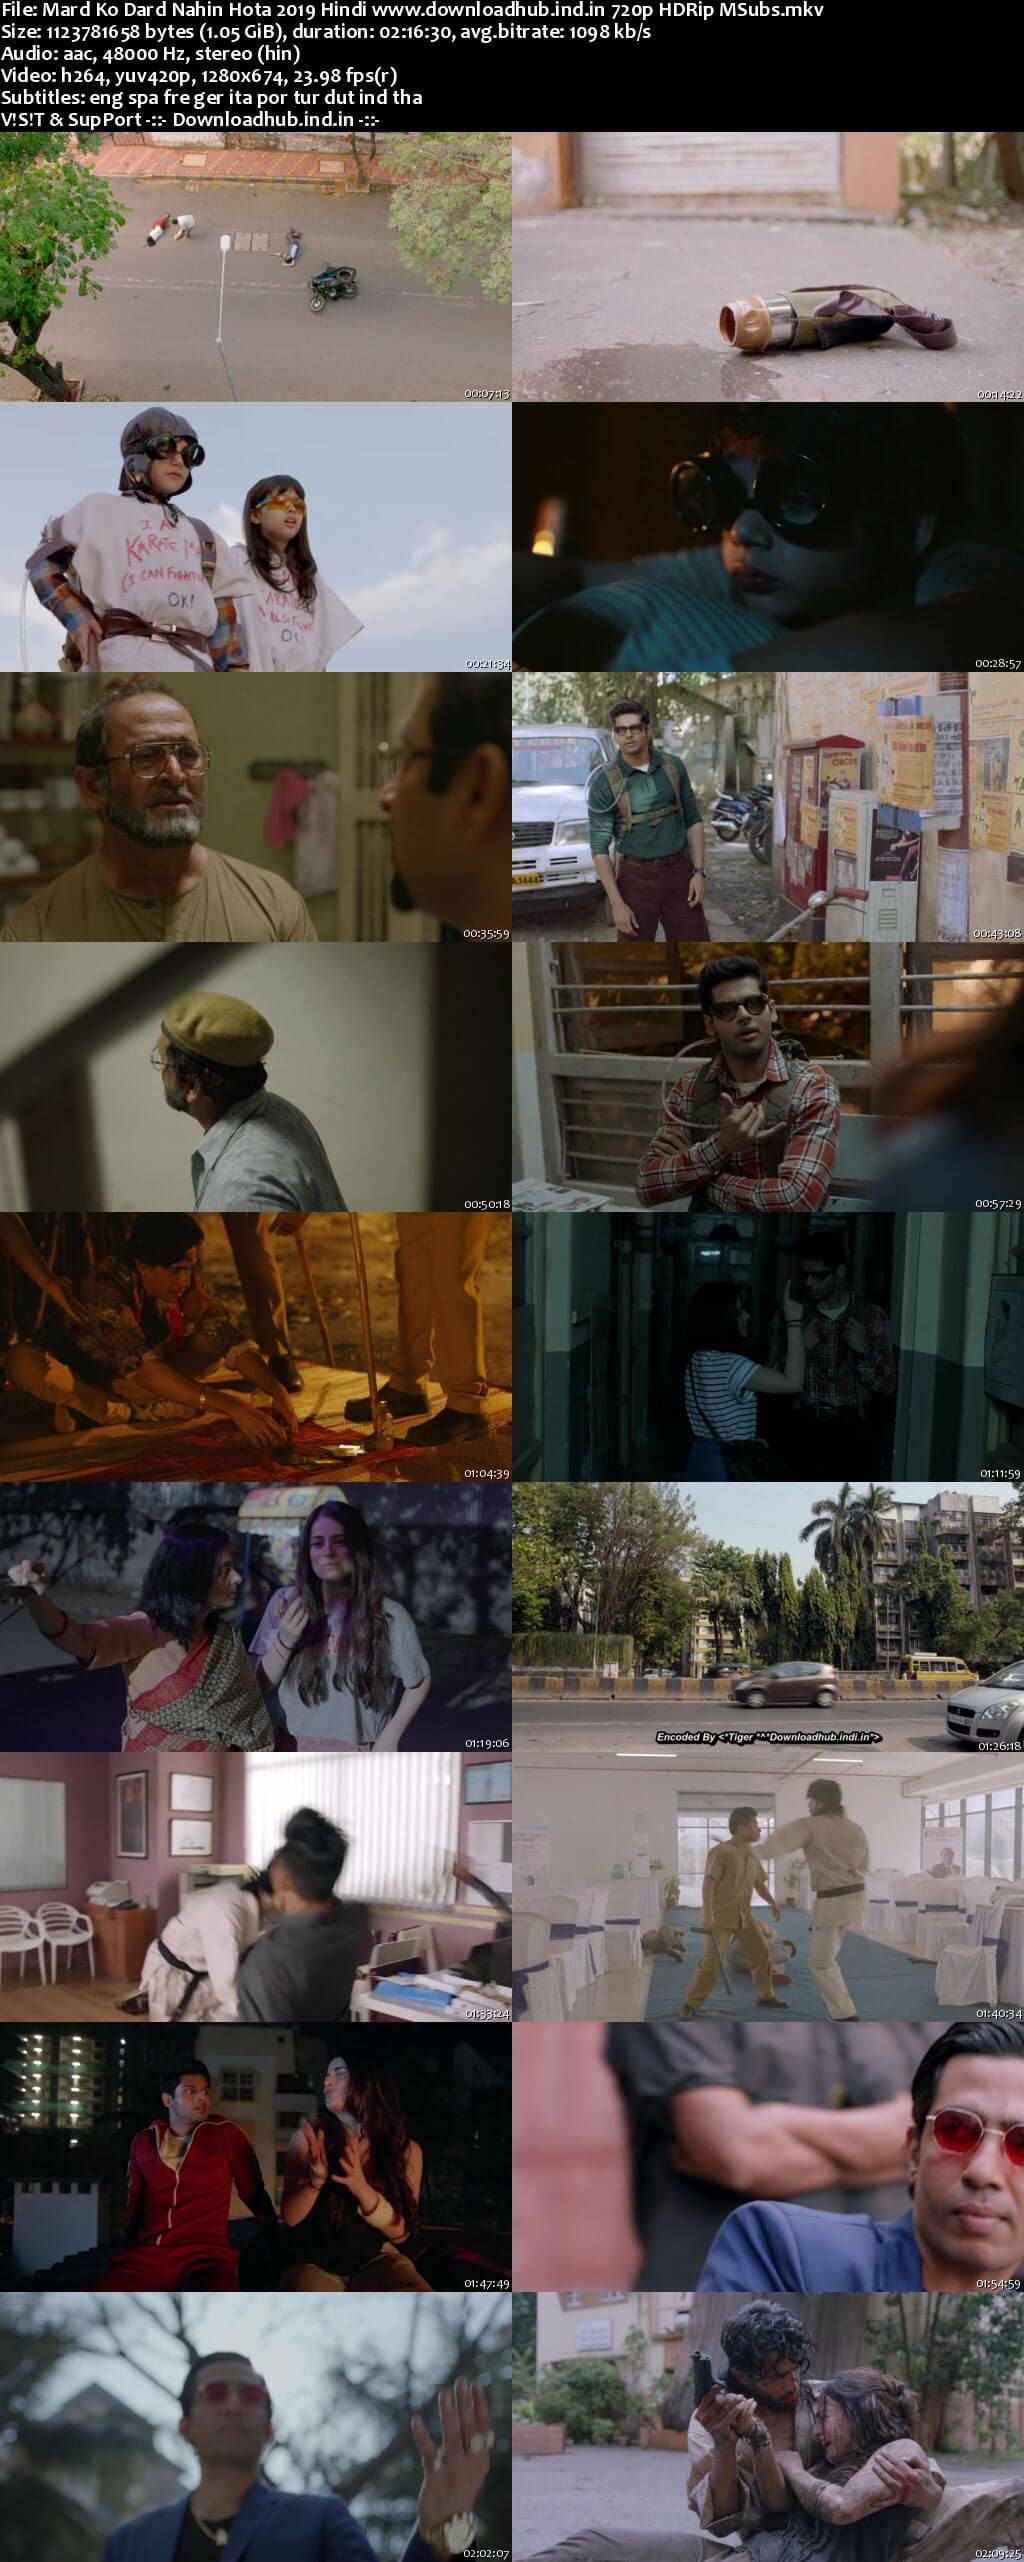 Mard Ko Dard Nahin Hota 2019 Hindi 720p HDRip MSubs